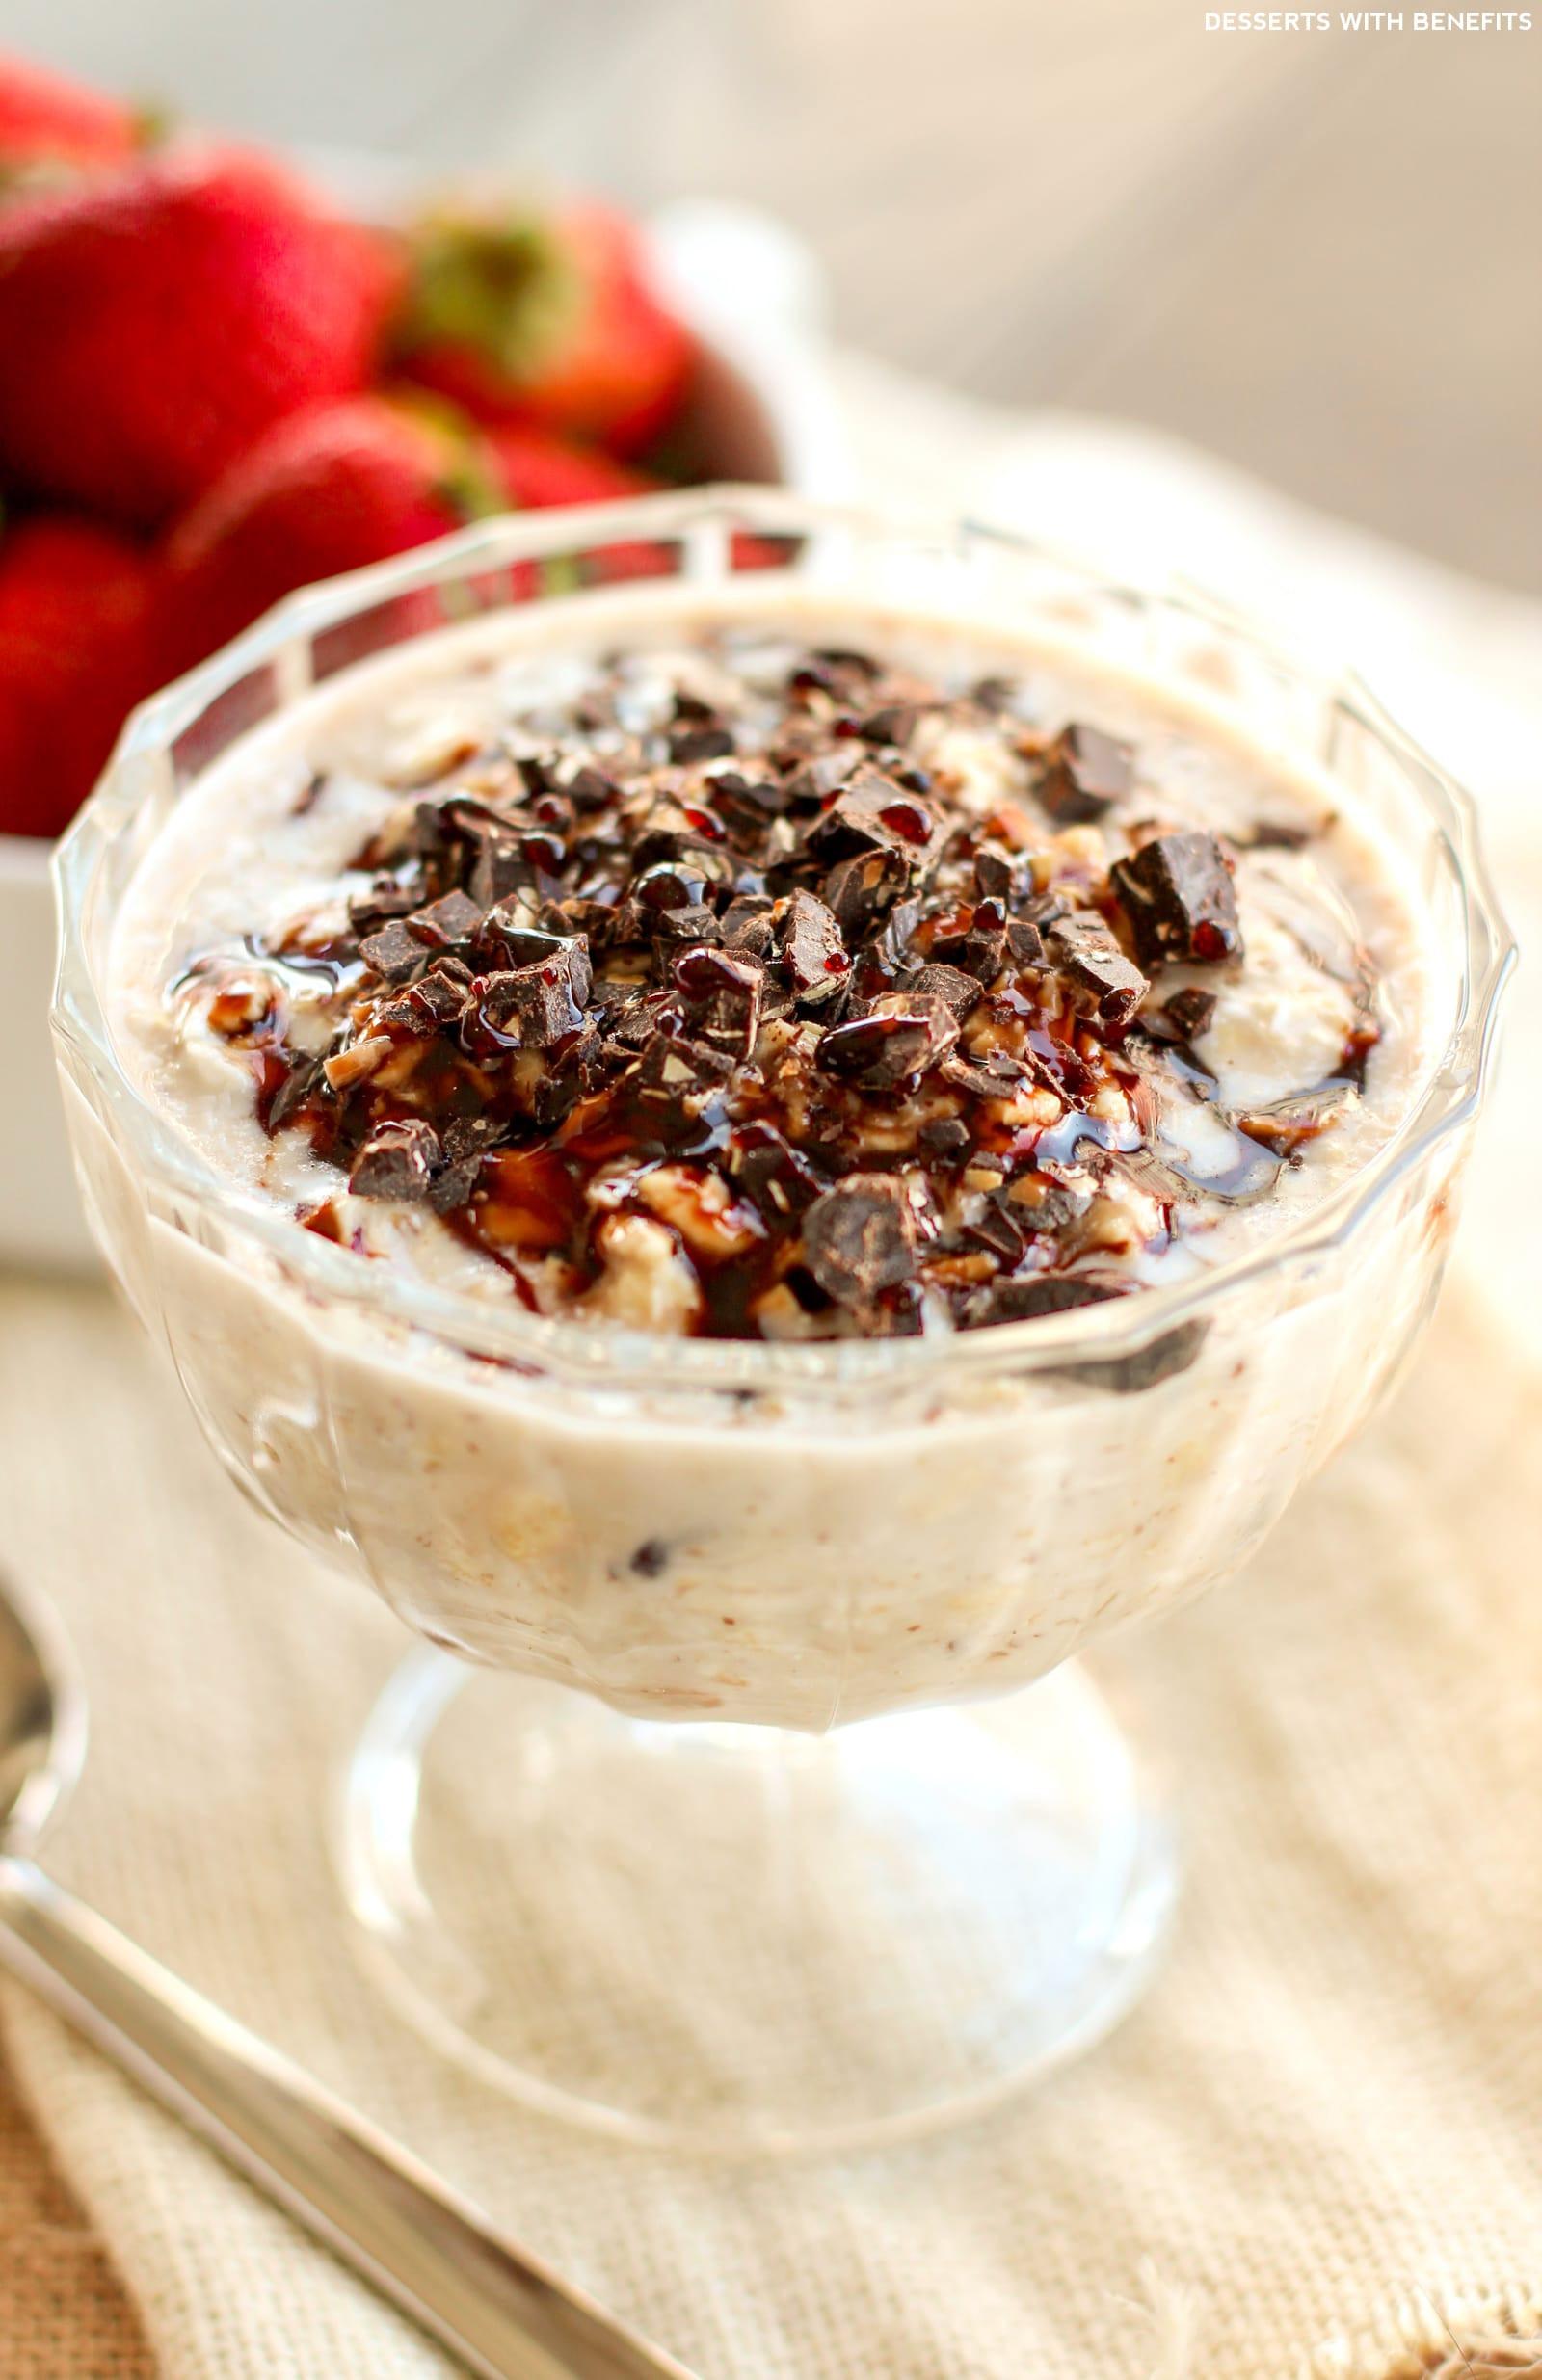 Healthy Gluten Free Desserts  Healthy Samoas Overnight Dessert Oats Recipe